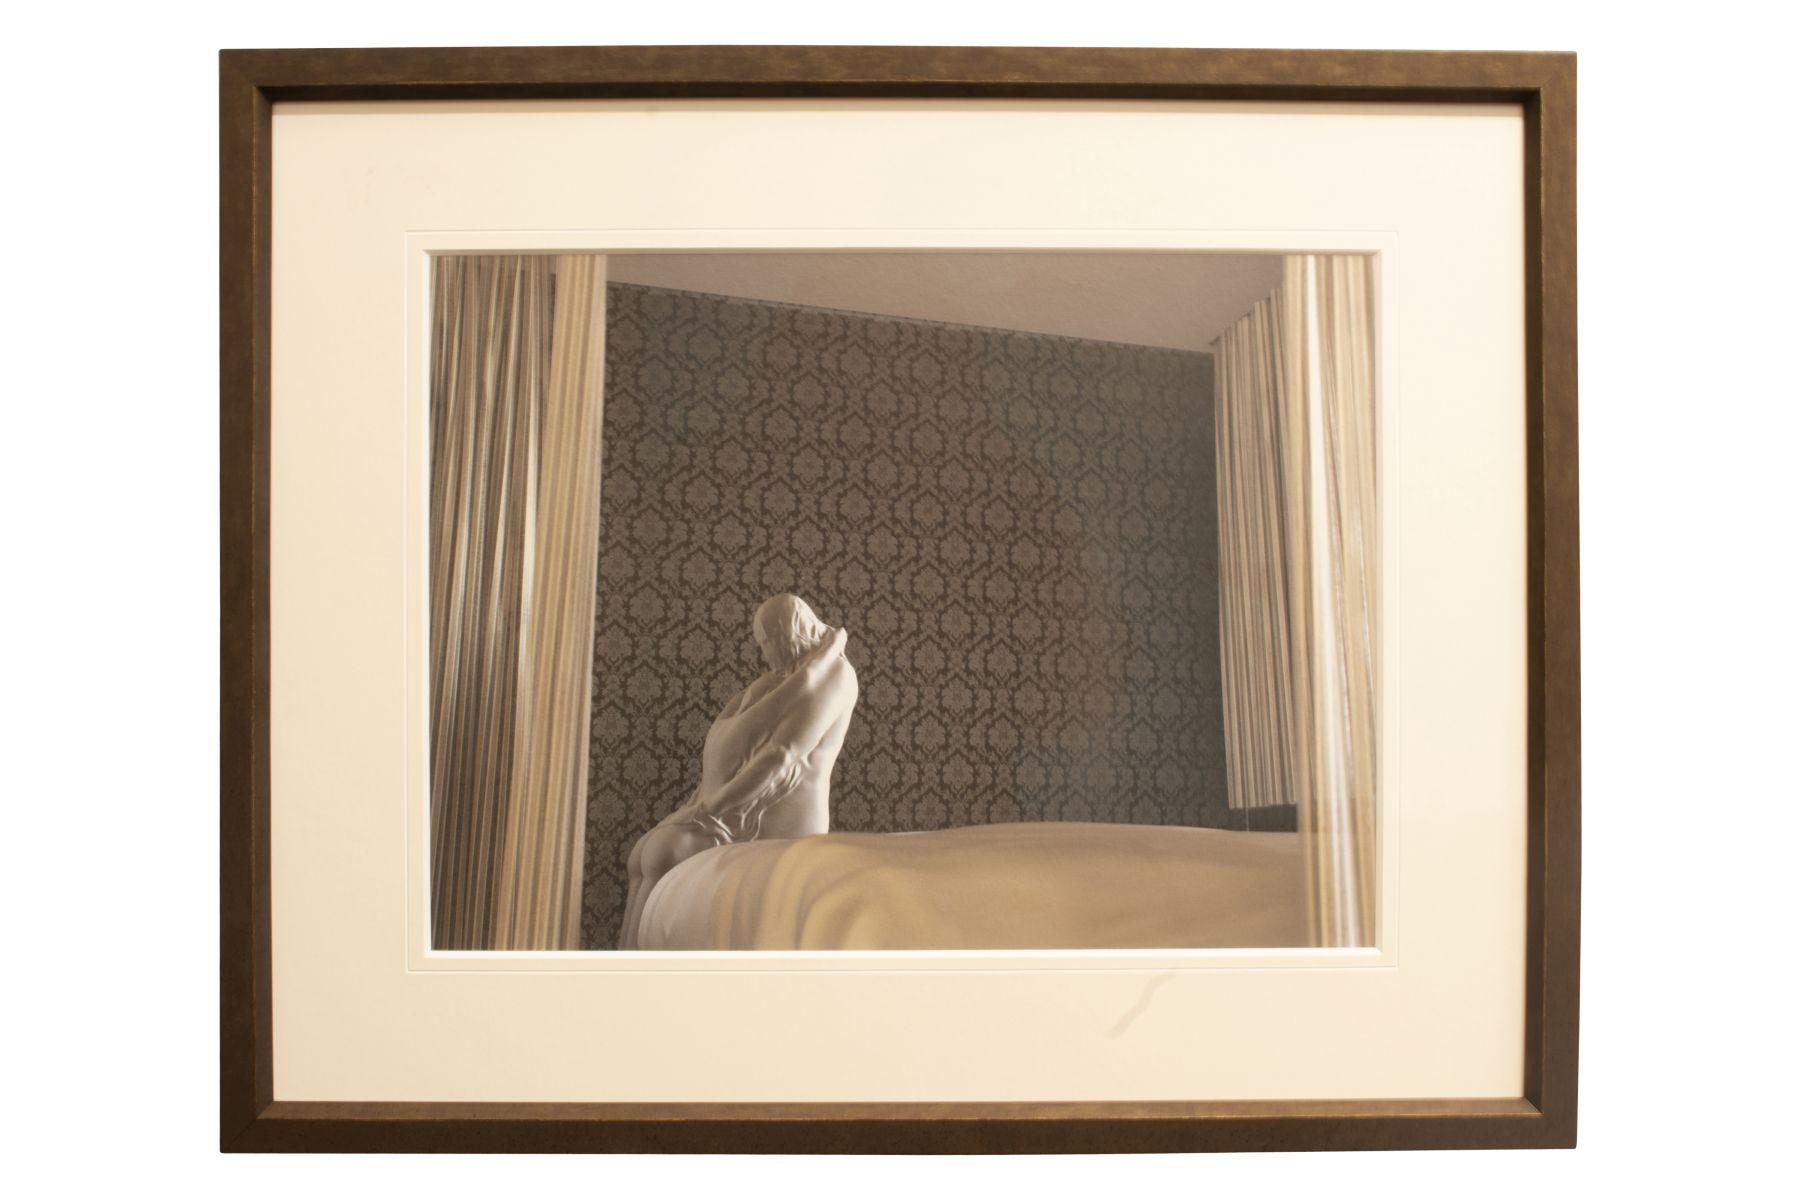 "#114 Stefan Krische (1986) "" Embrace"" | Stefan Krische (1986) ""Umarmung"" Image"